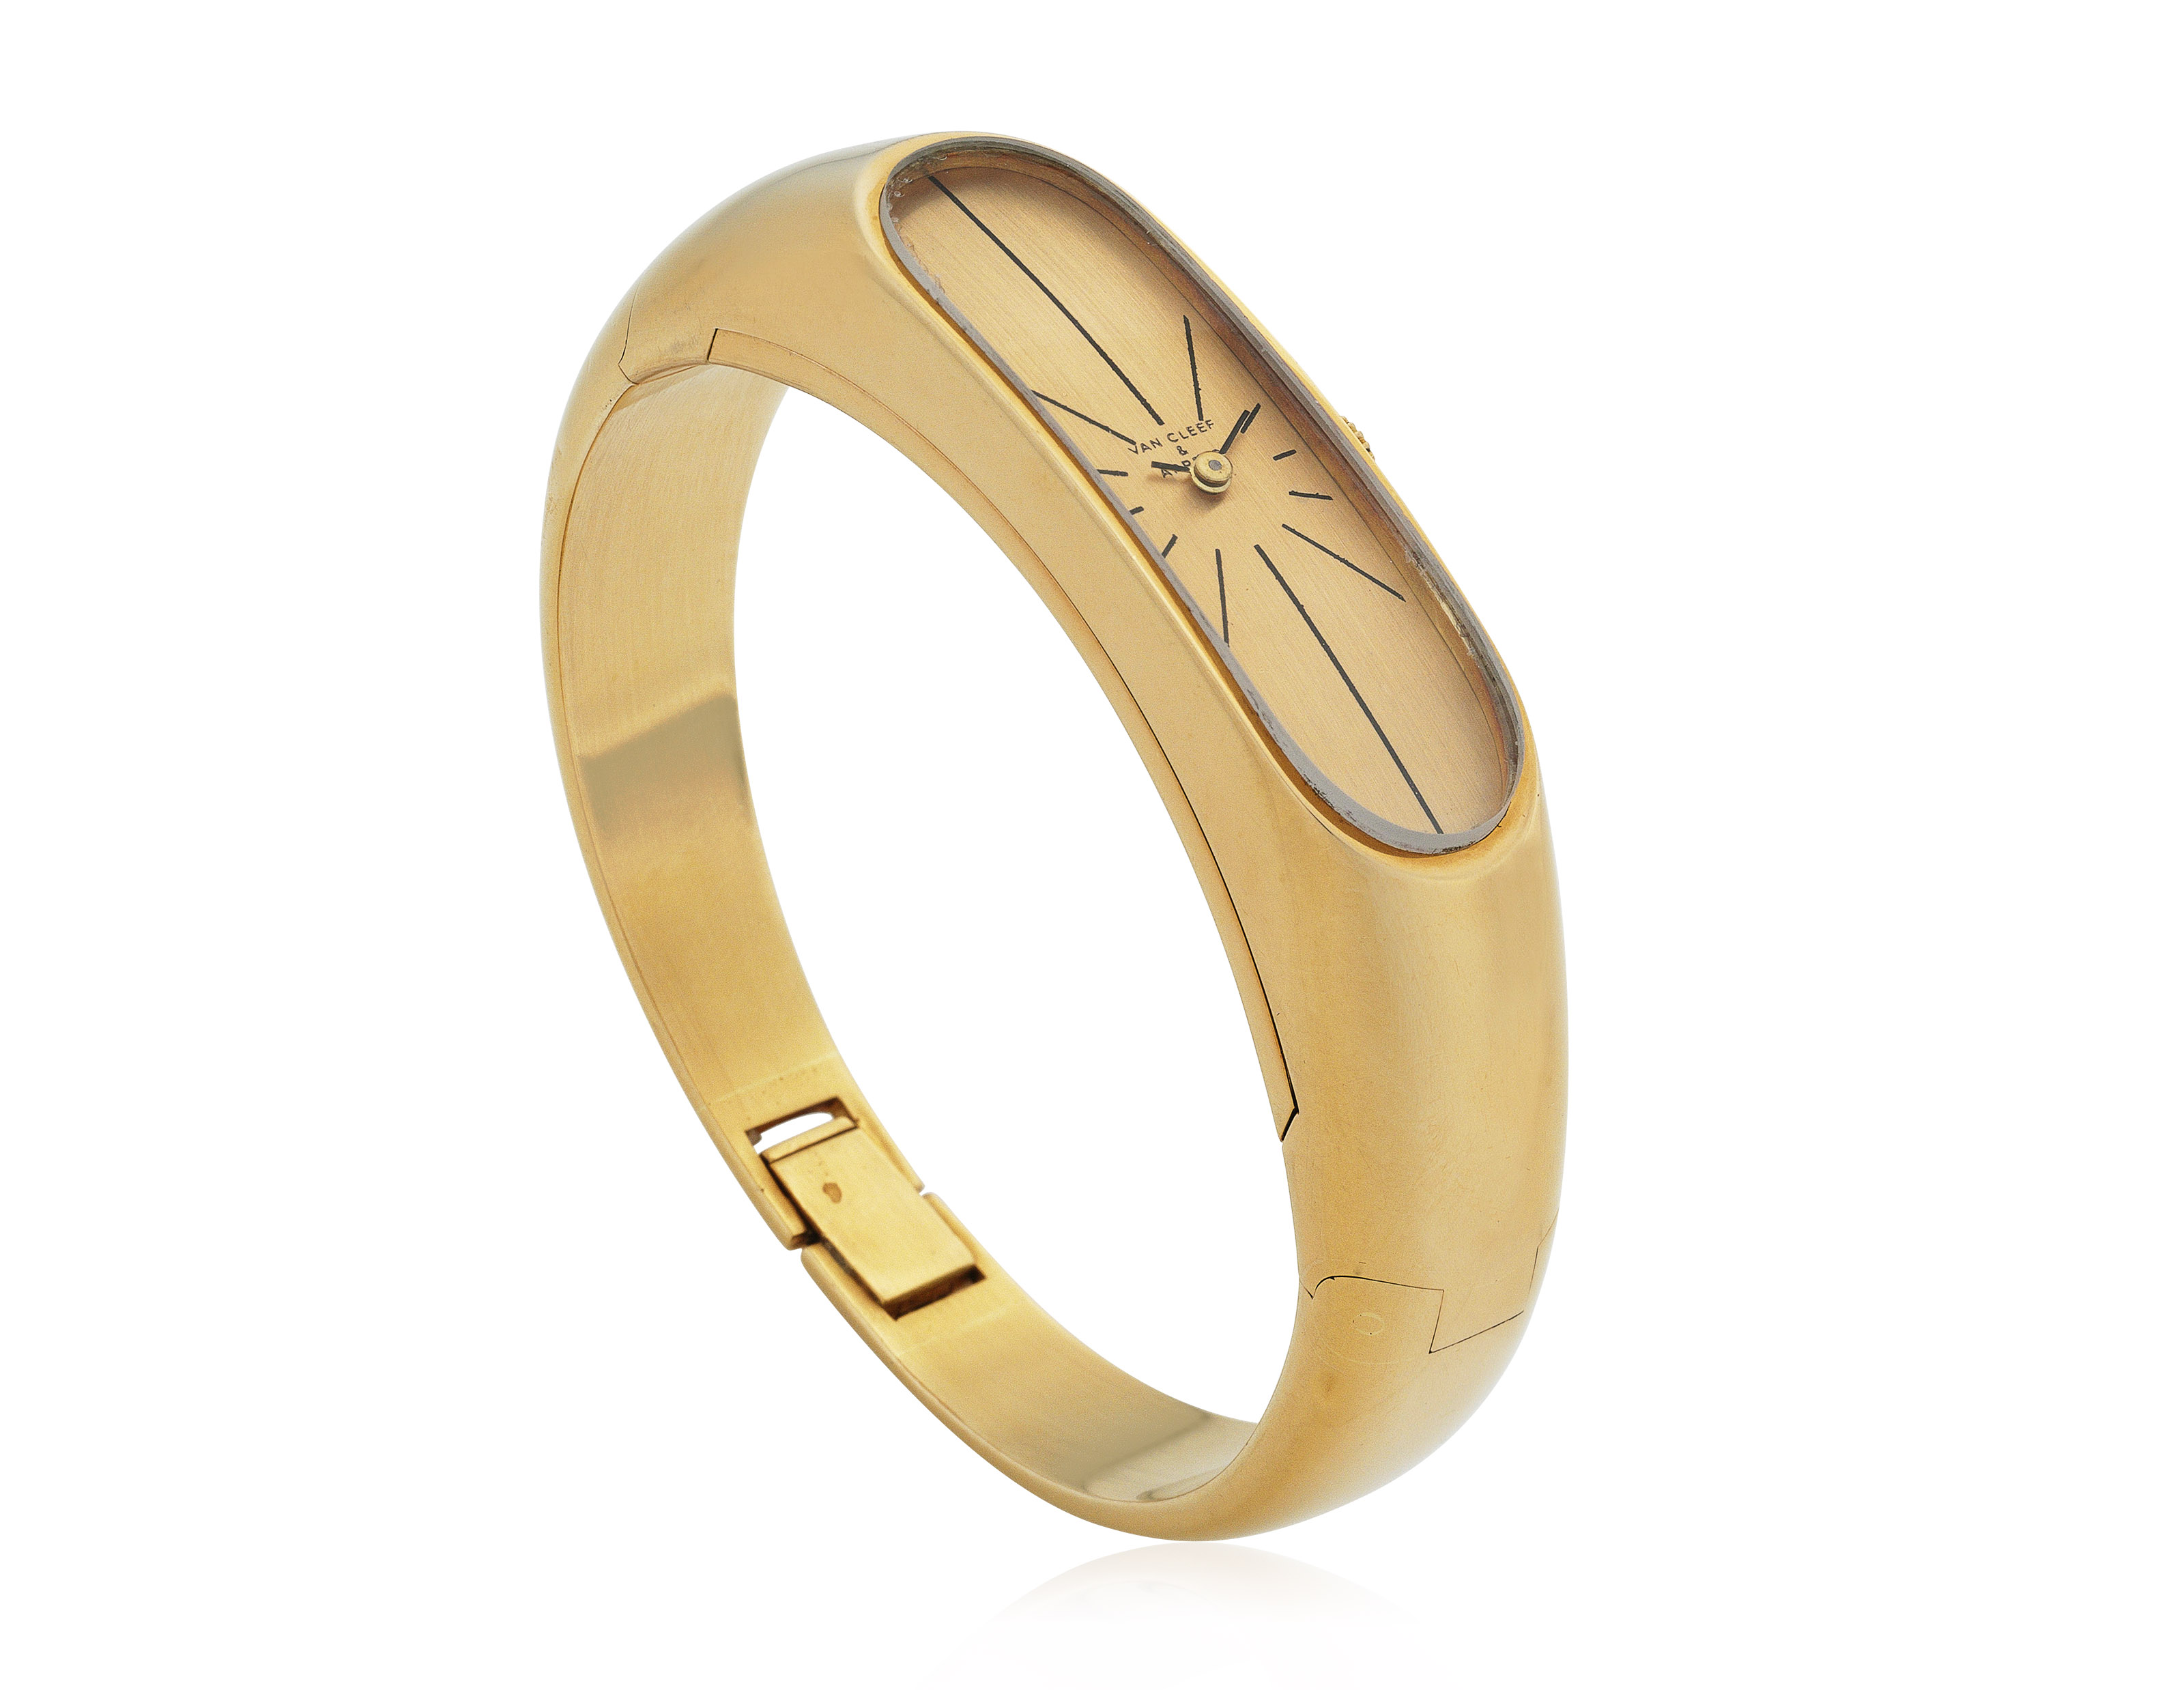 VAN CLEEF & ARPELS GOLD BRACEL